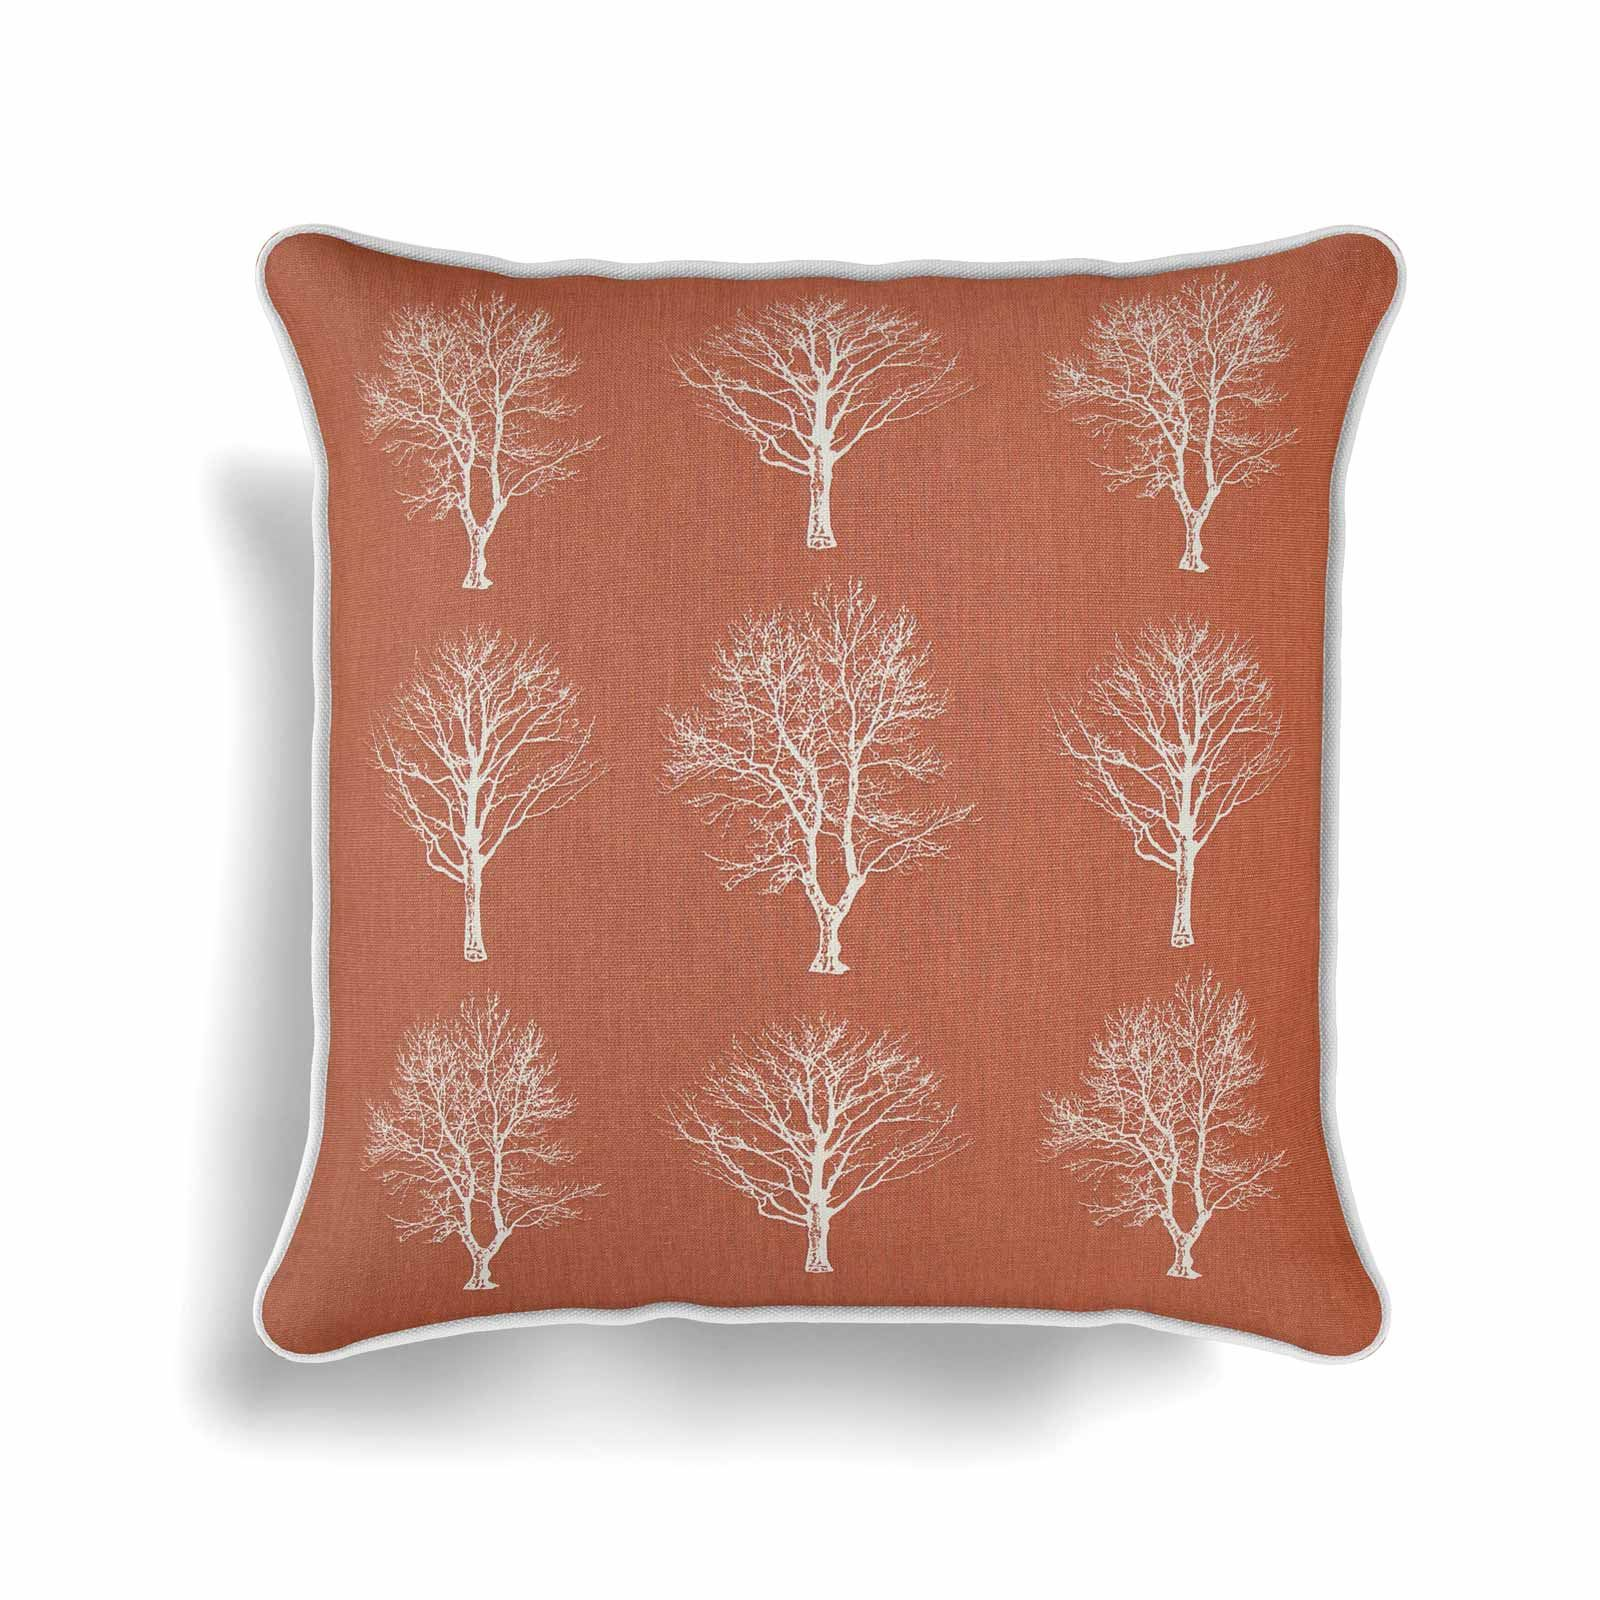 Woodland-Trees-Cushion-Cover-Modern-Reversible-Tree-Print-Covers-17-034-x-17-034 thumbnail 10